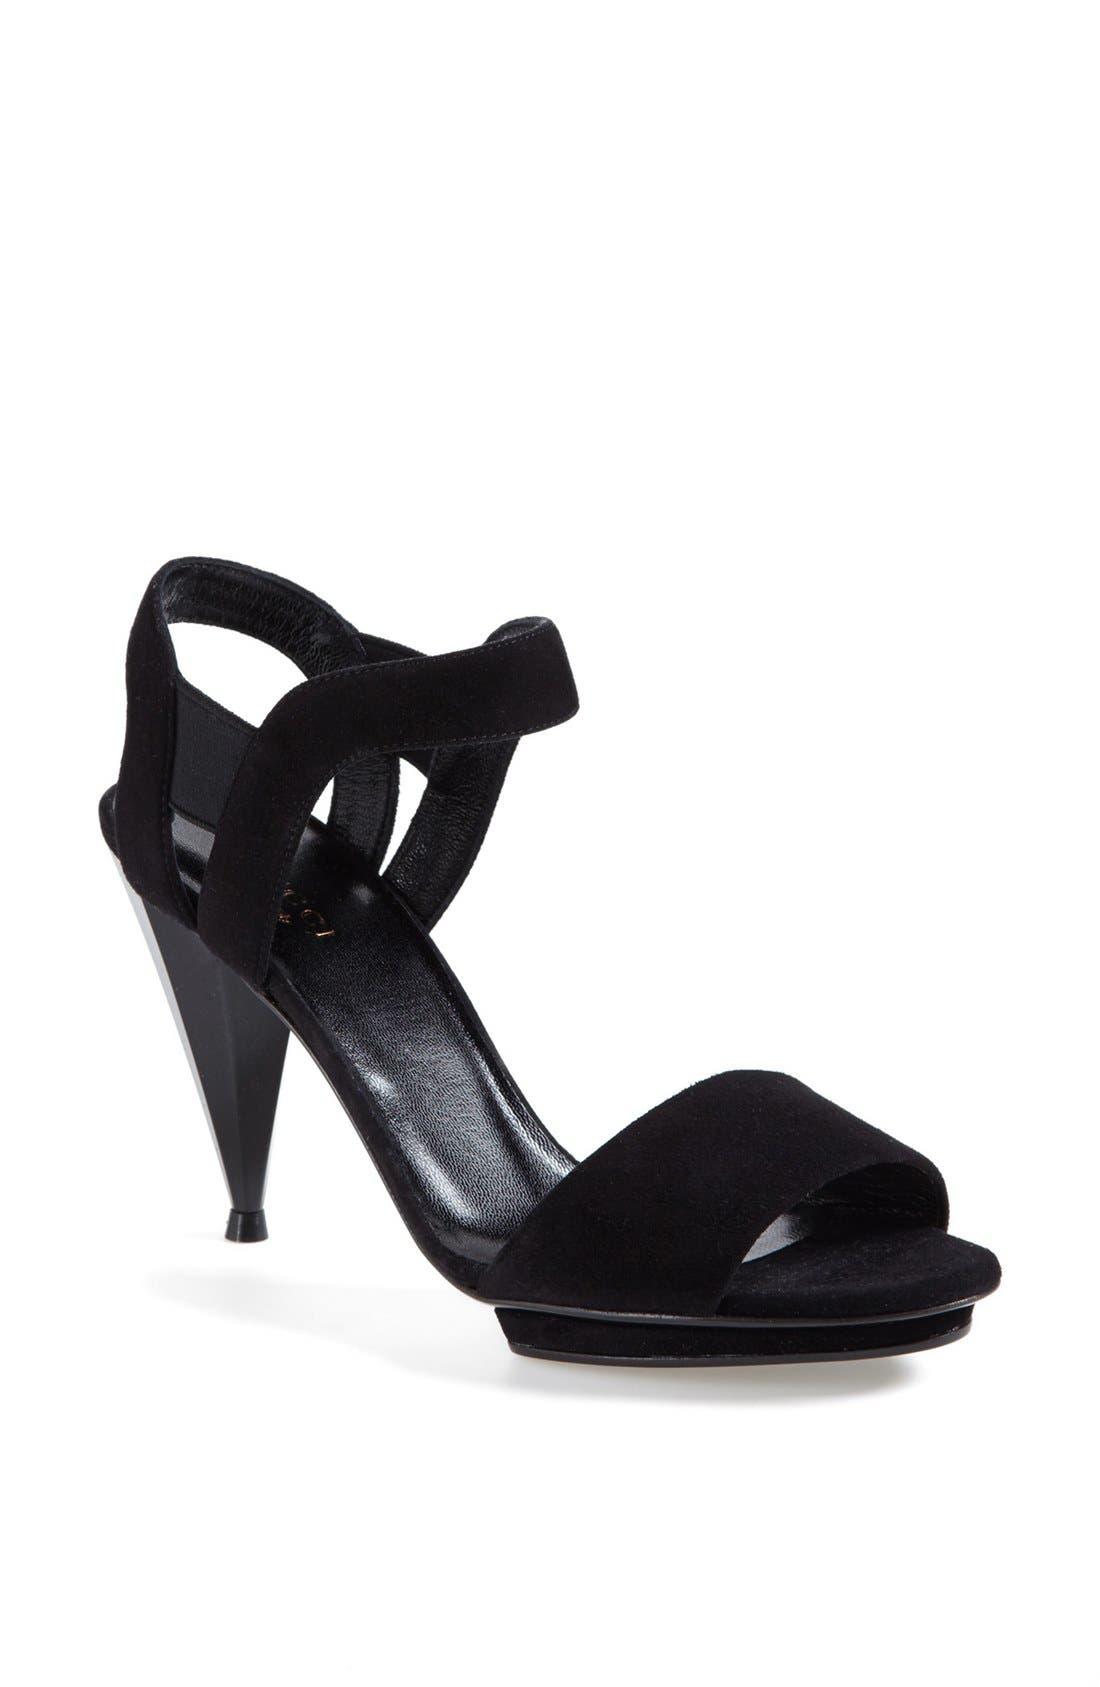 Main Image - Gucci 'Liberty' Sandal